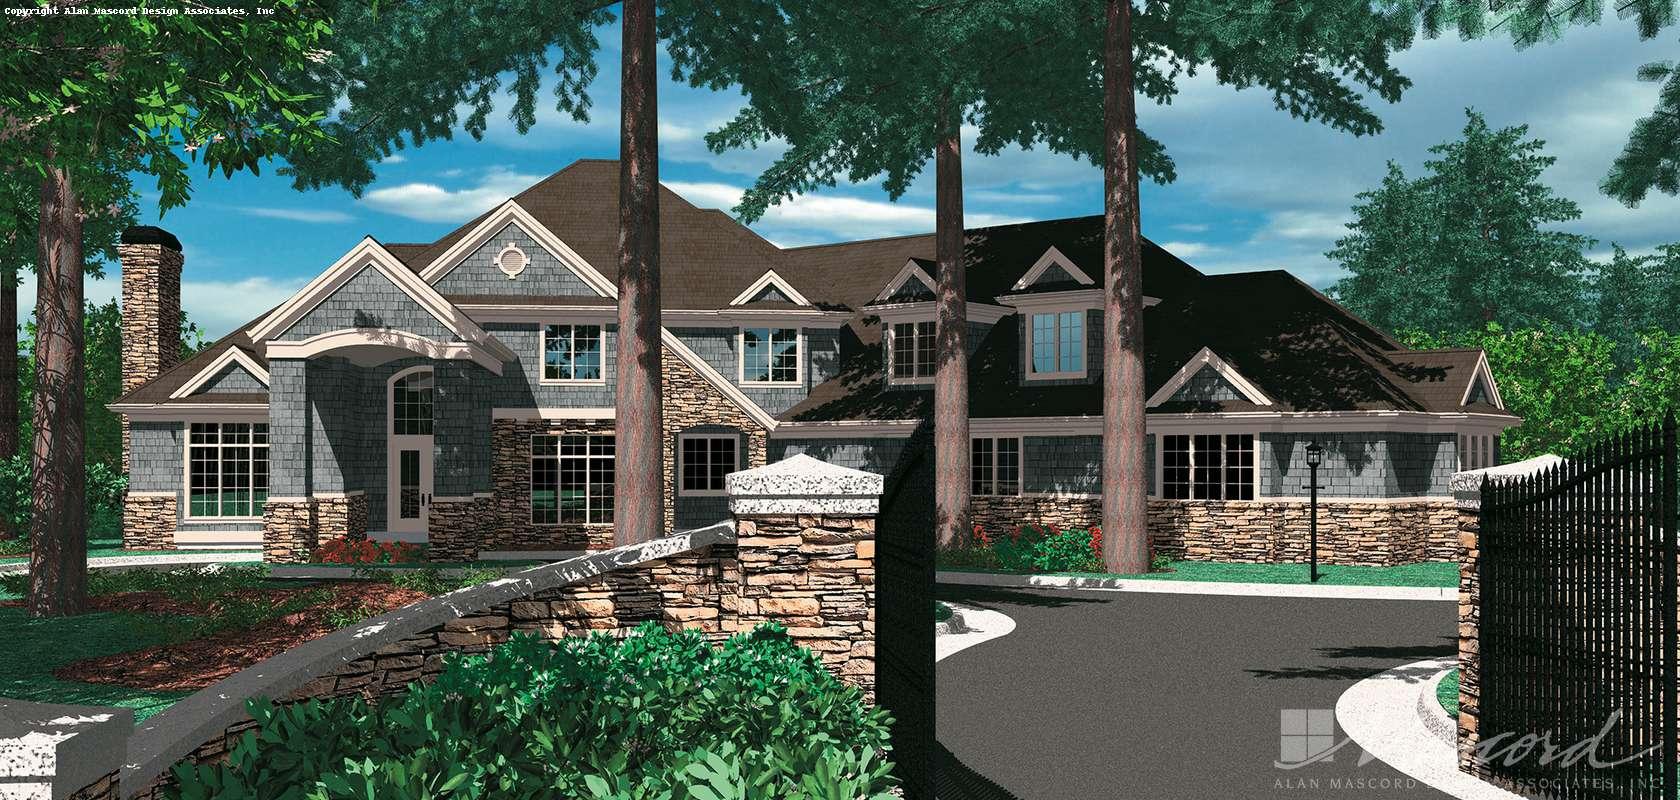 Mascord House Plan B2414B-Truss Roof: The Lanagan